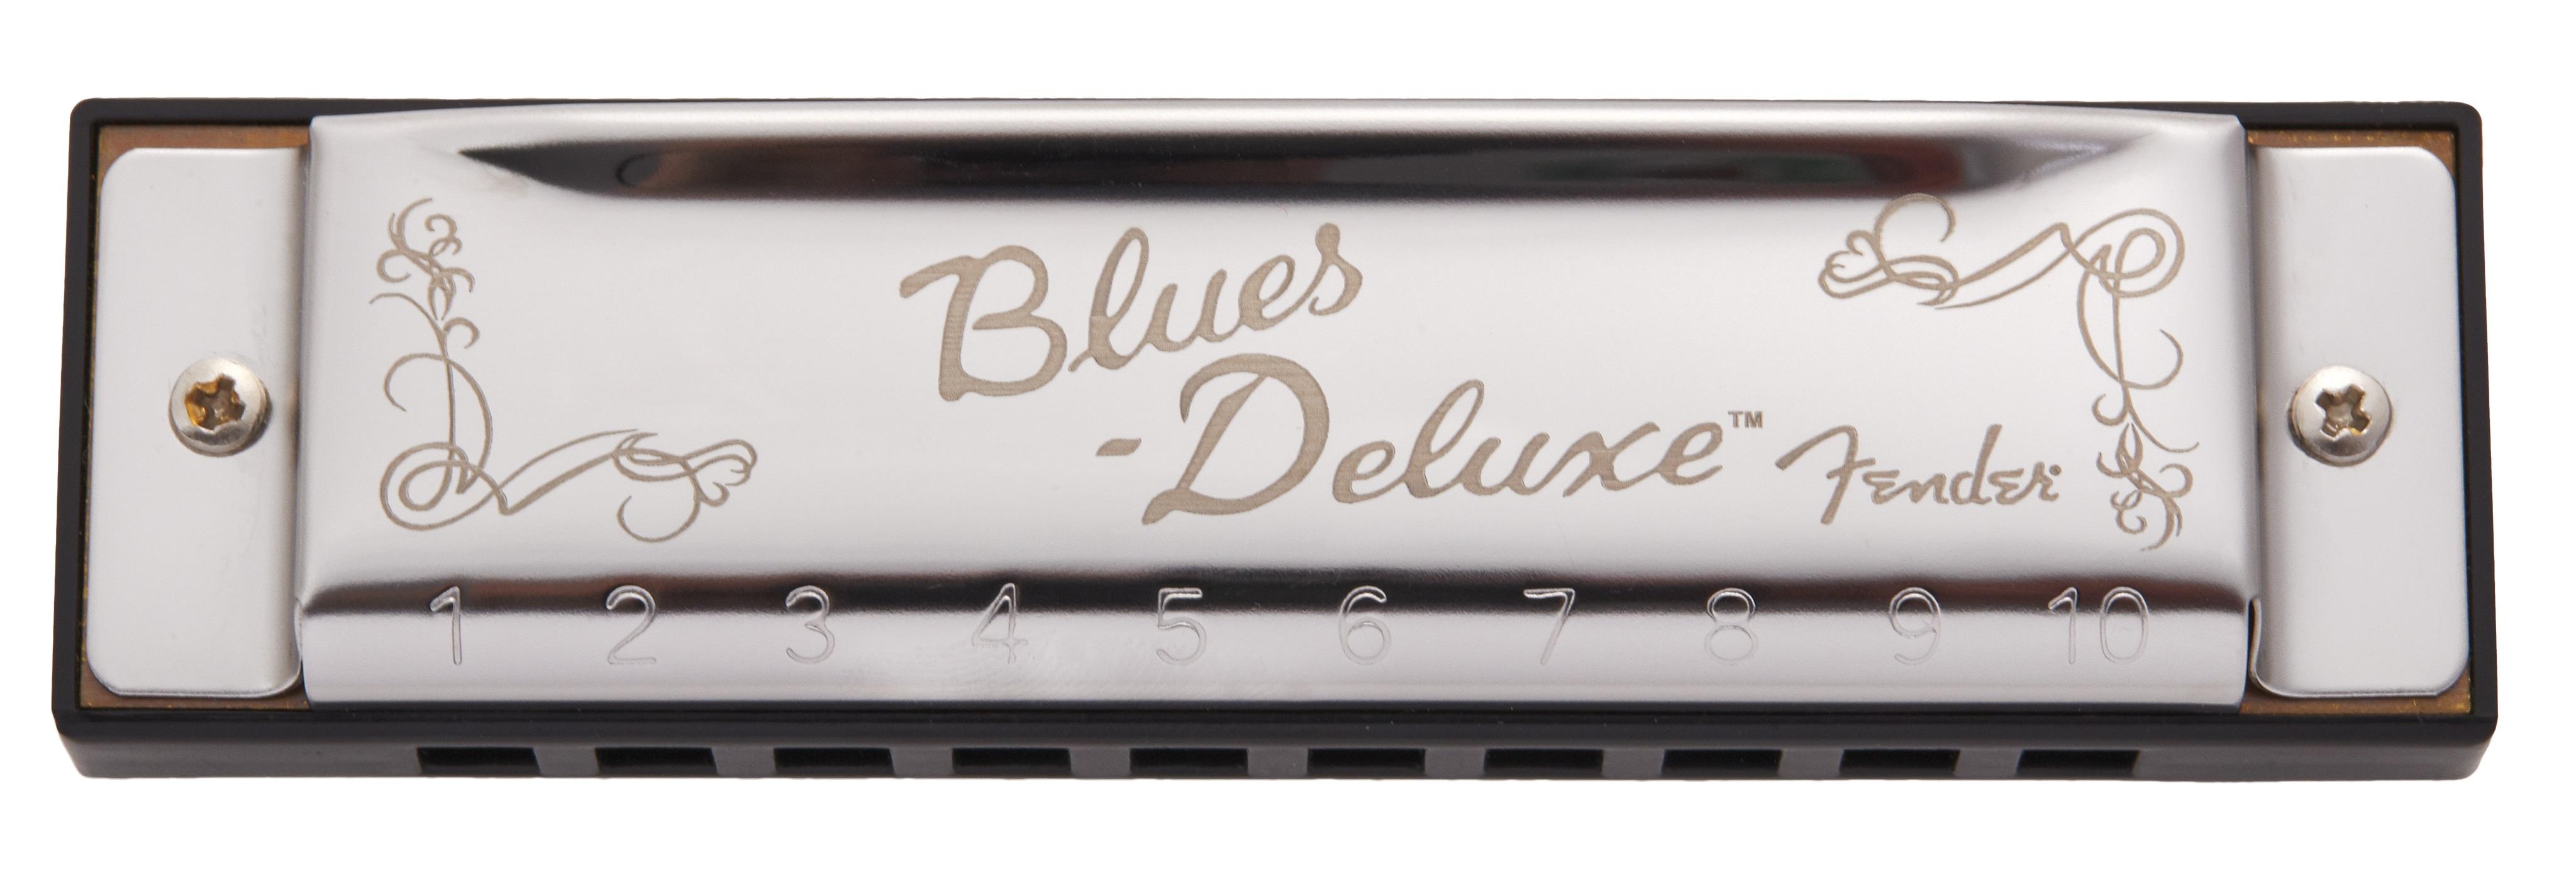 Fender Blues Deluxe Key of C